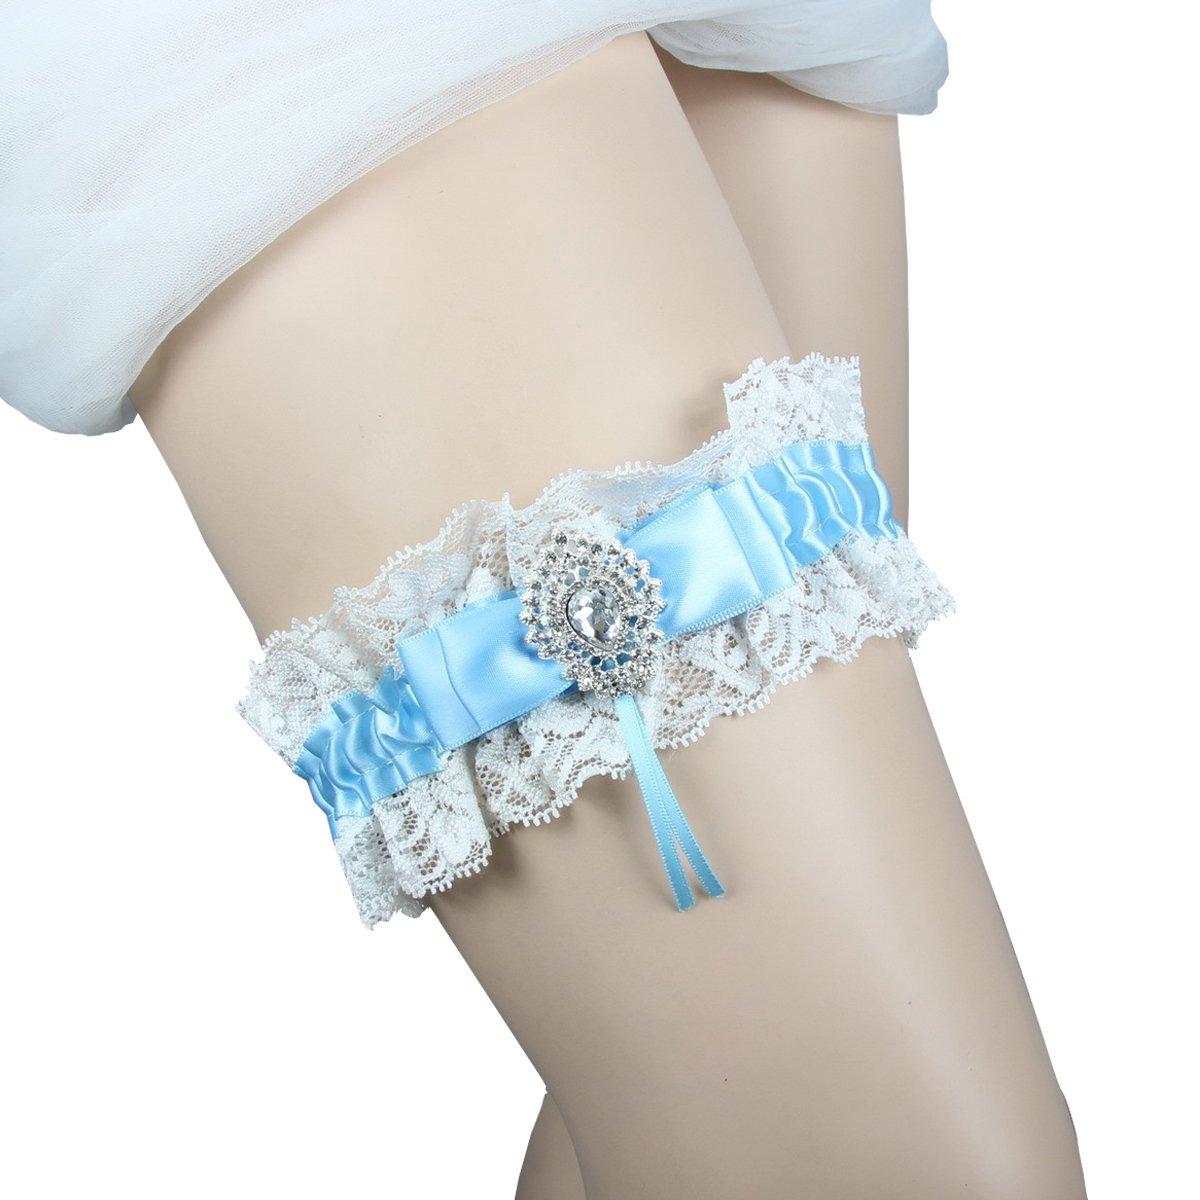 Kirmoo Vintage Lace Satin Bridal Garter Something Blue Wedding Garter White with Rhinestones (One Size Fit All)